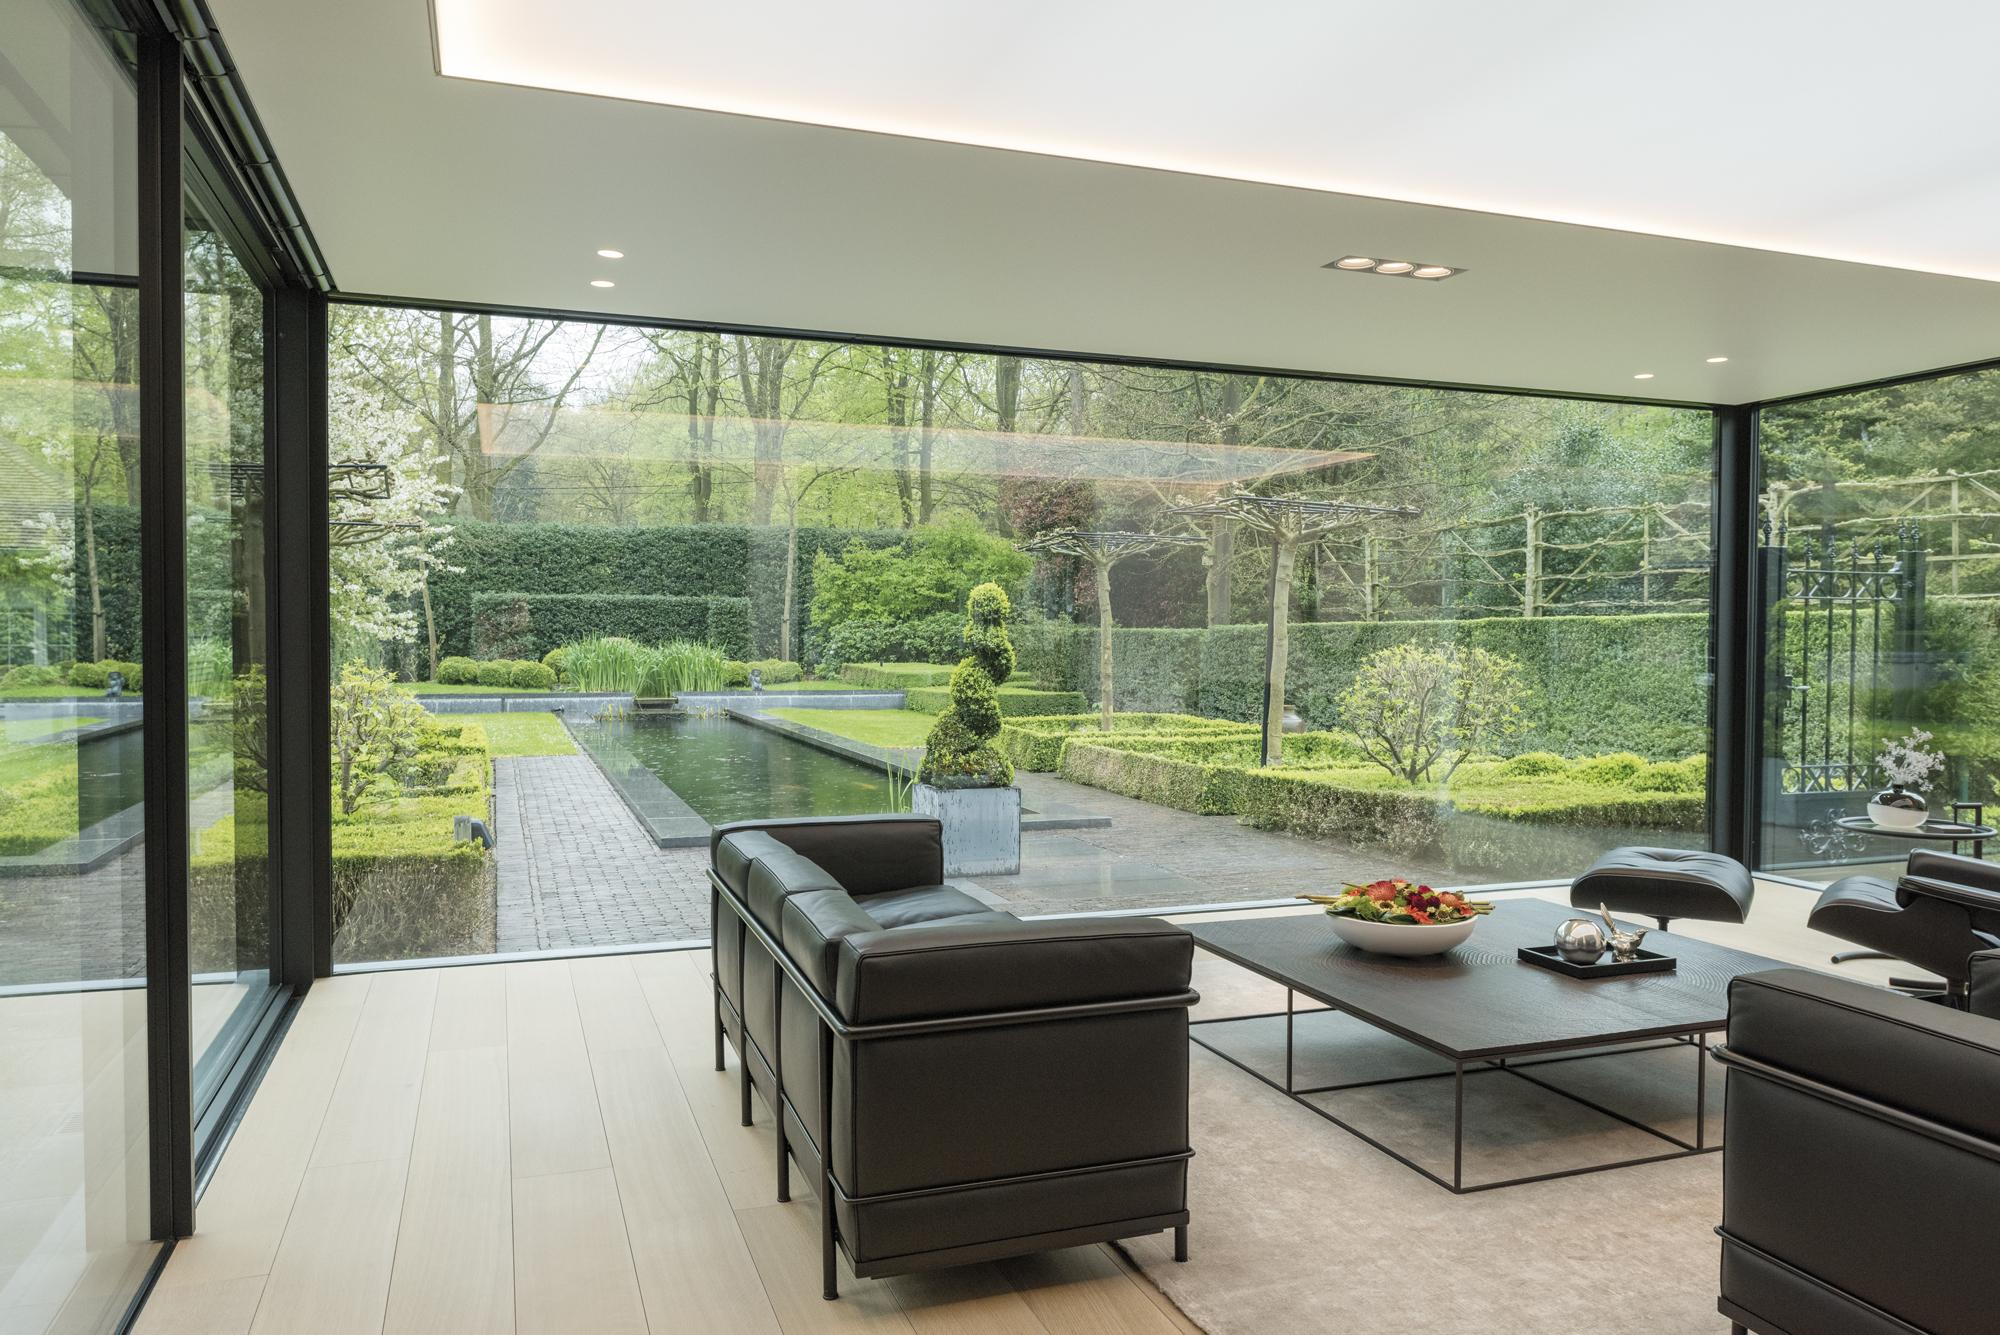 weggewerkte profielen in moderne serre bruynseels vochten. Black Bedroom Furniture Sets. Home Design Ideas